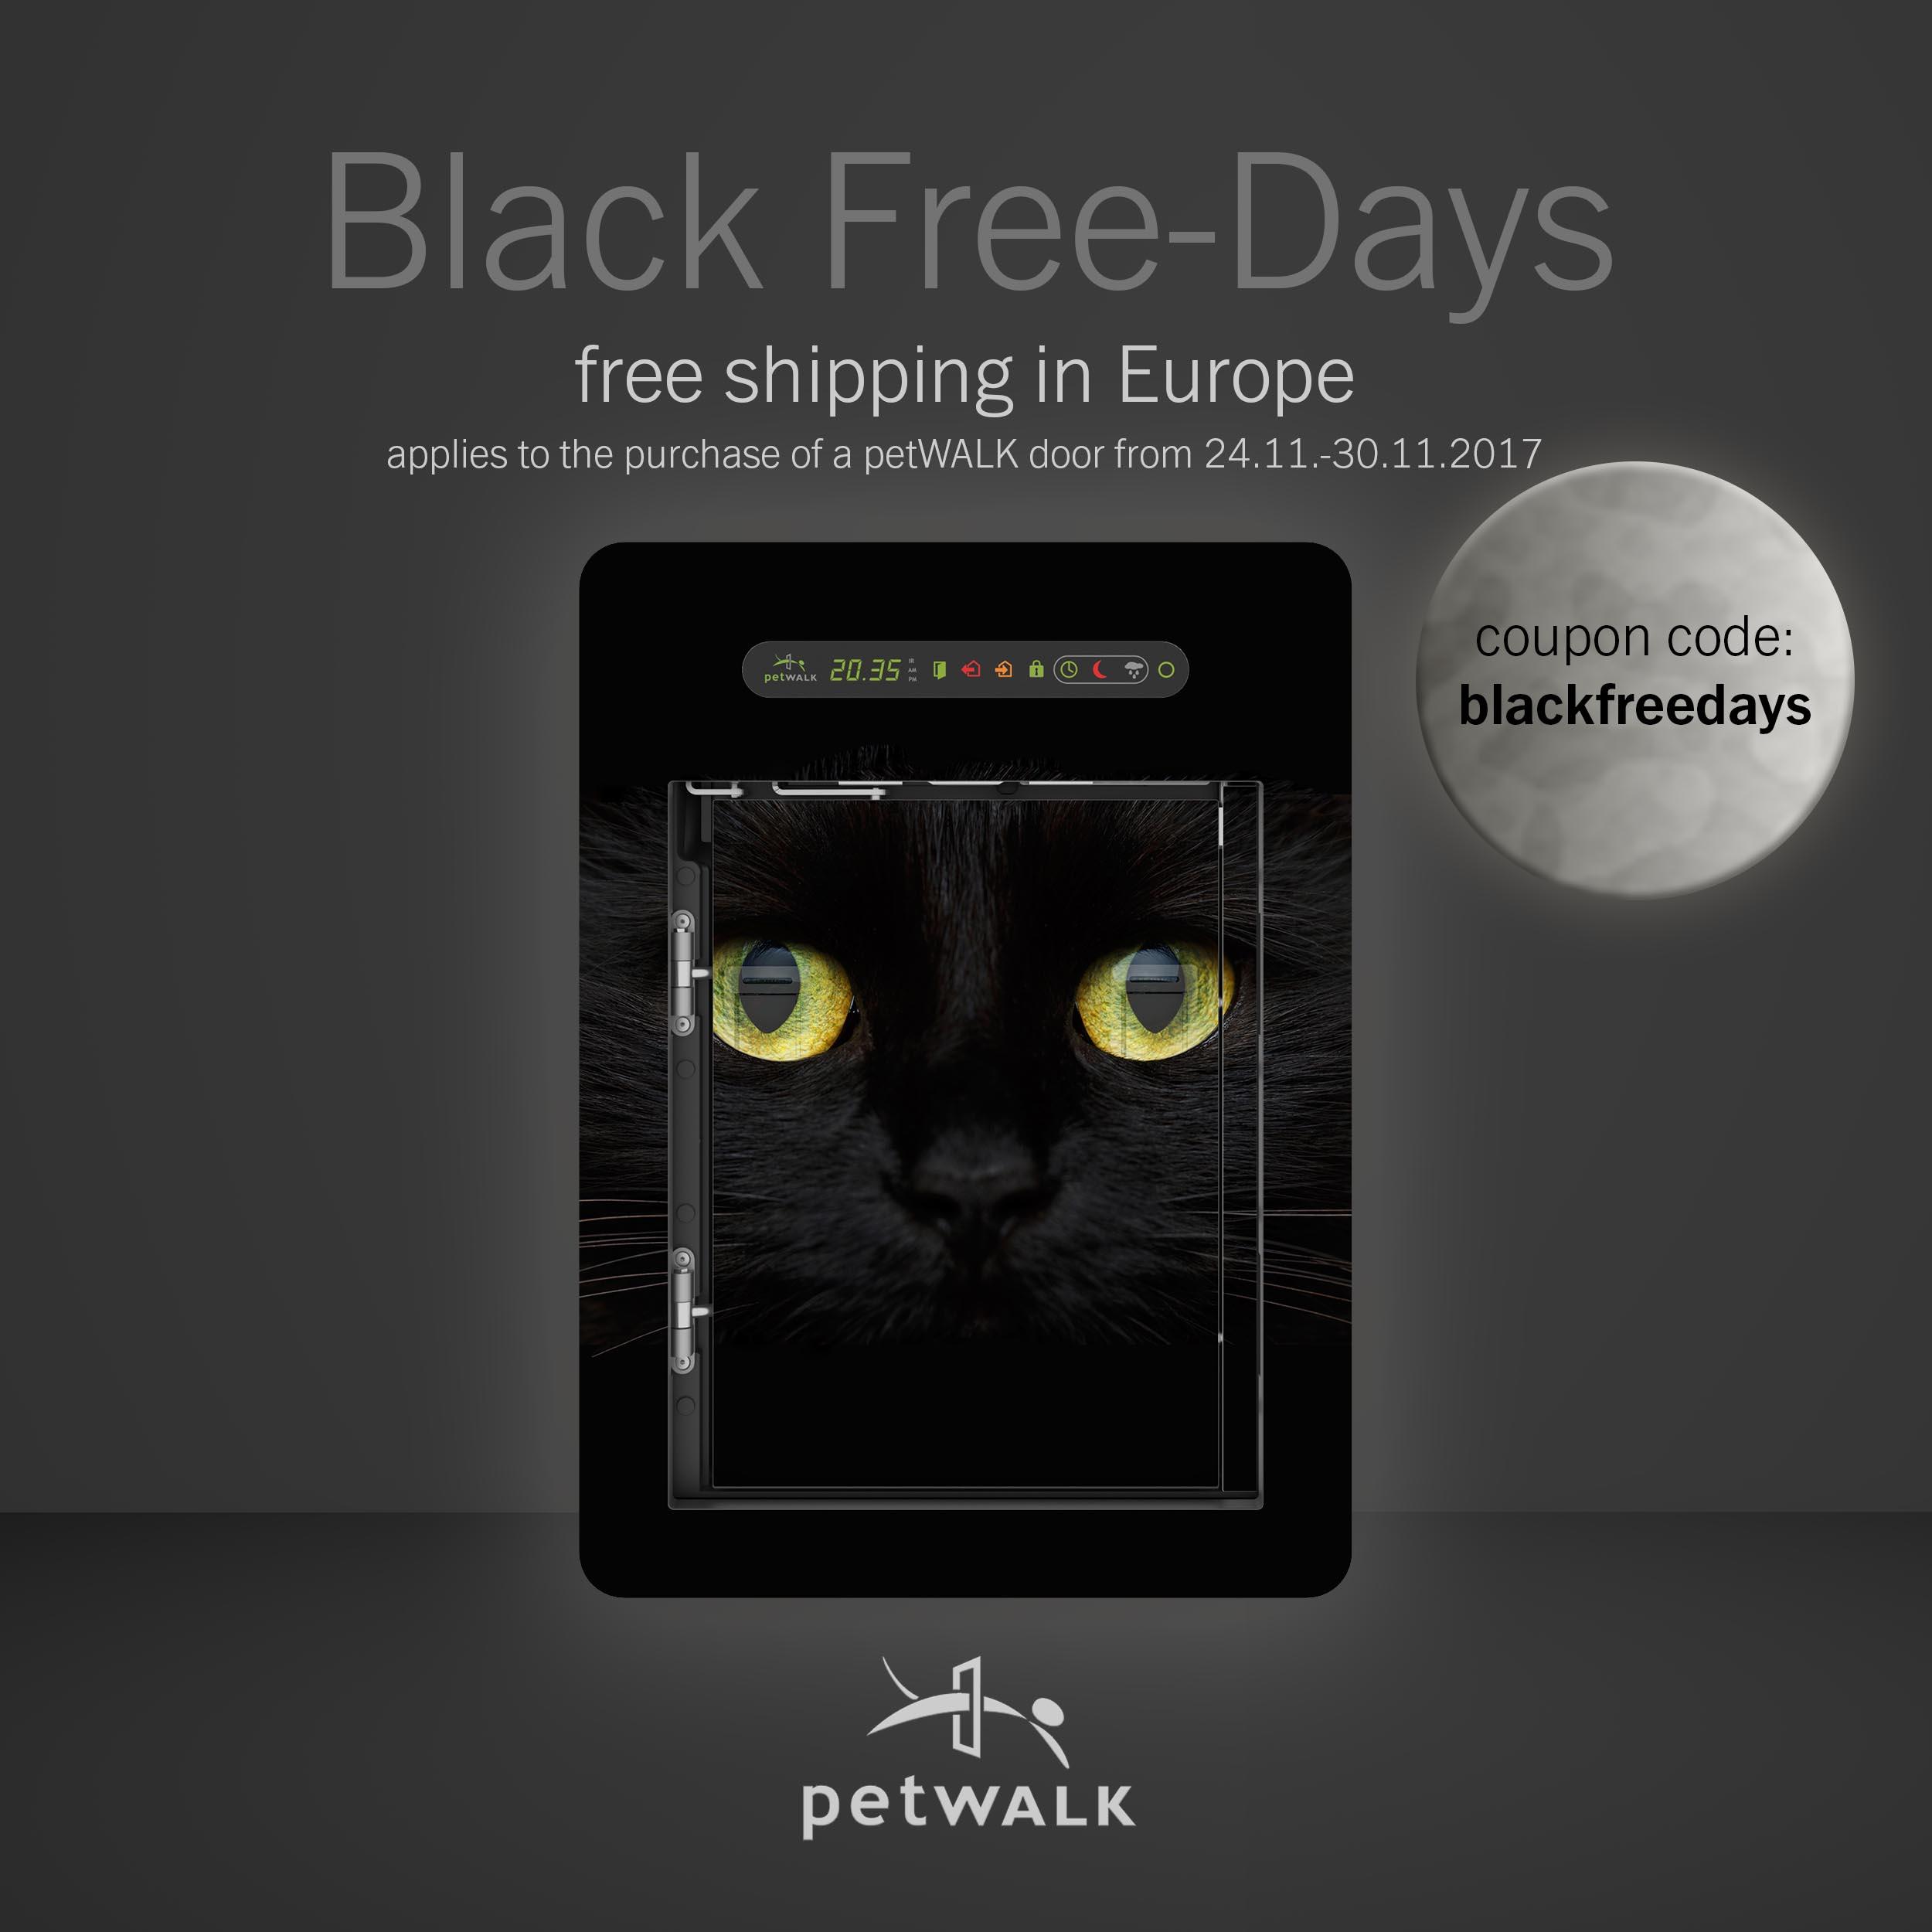 Black Free-Days